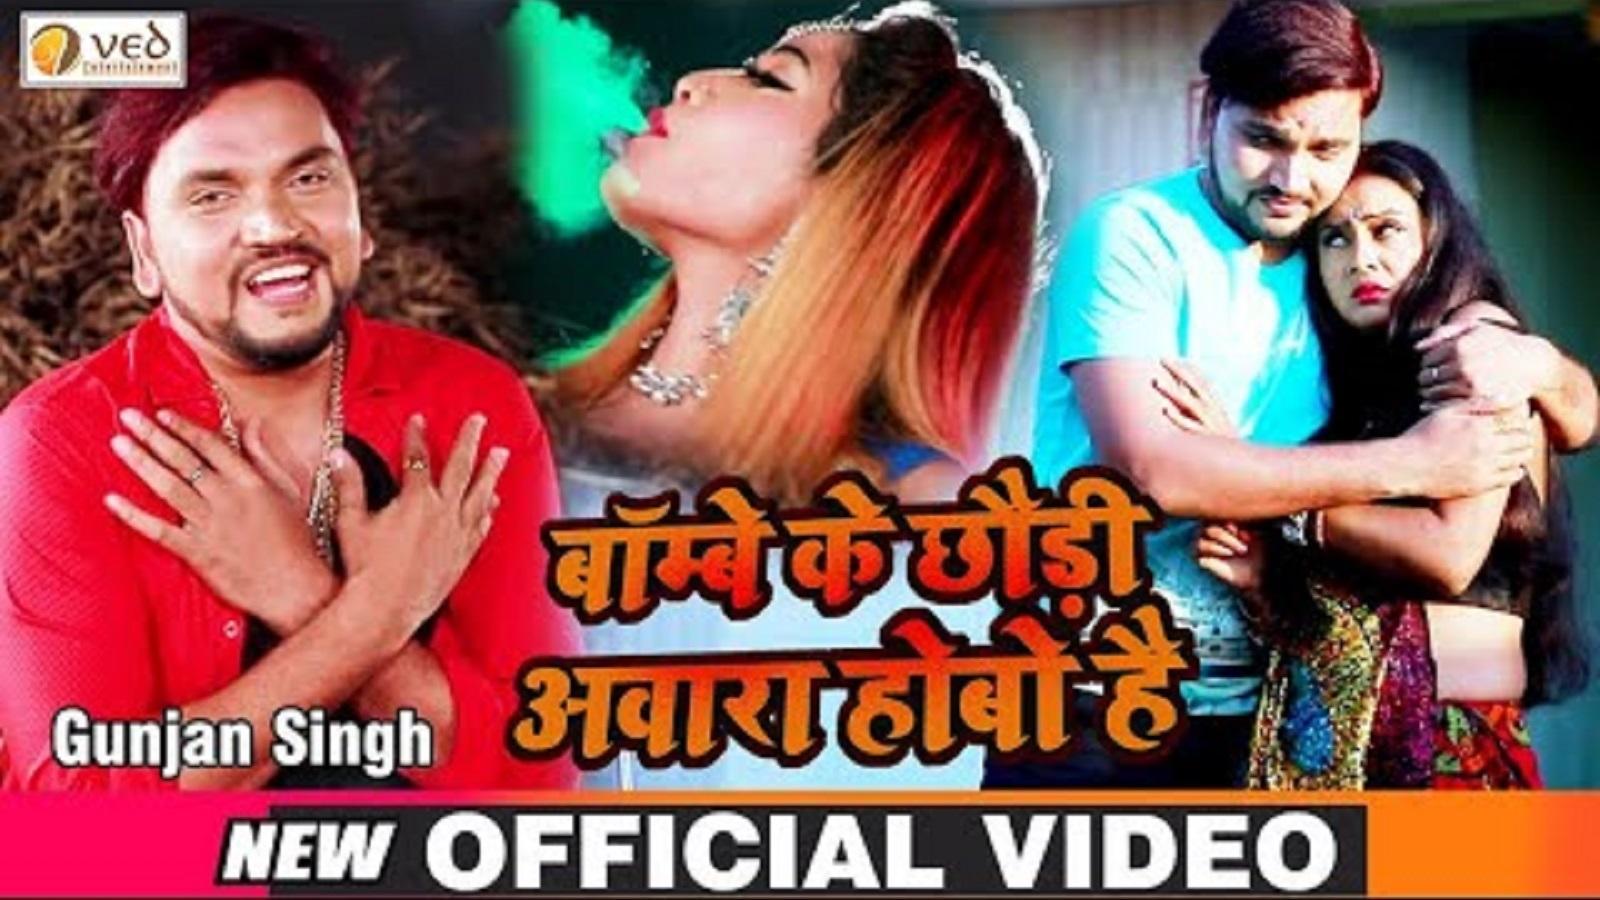 New Bhojpuri Song Video 2020: Gunjan Singh's Latest Bhojpuri Gana Video  Song 'Bambay Ke Chhauri Awara Hobo Hai'